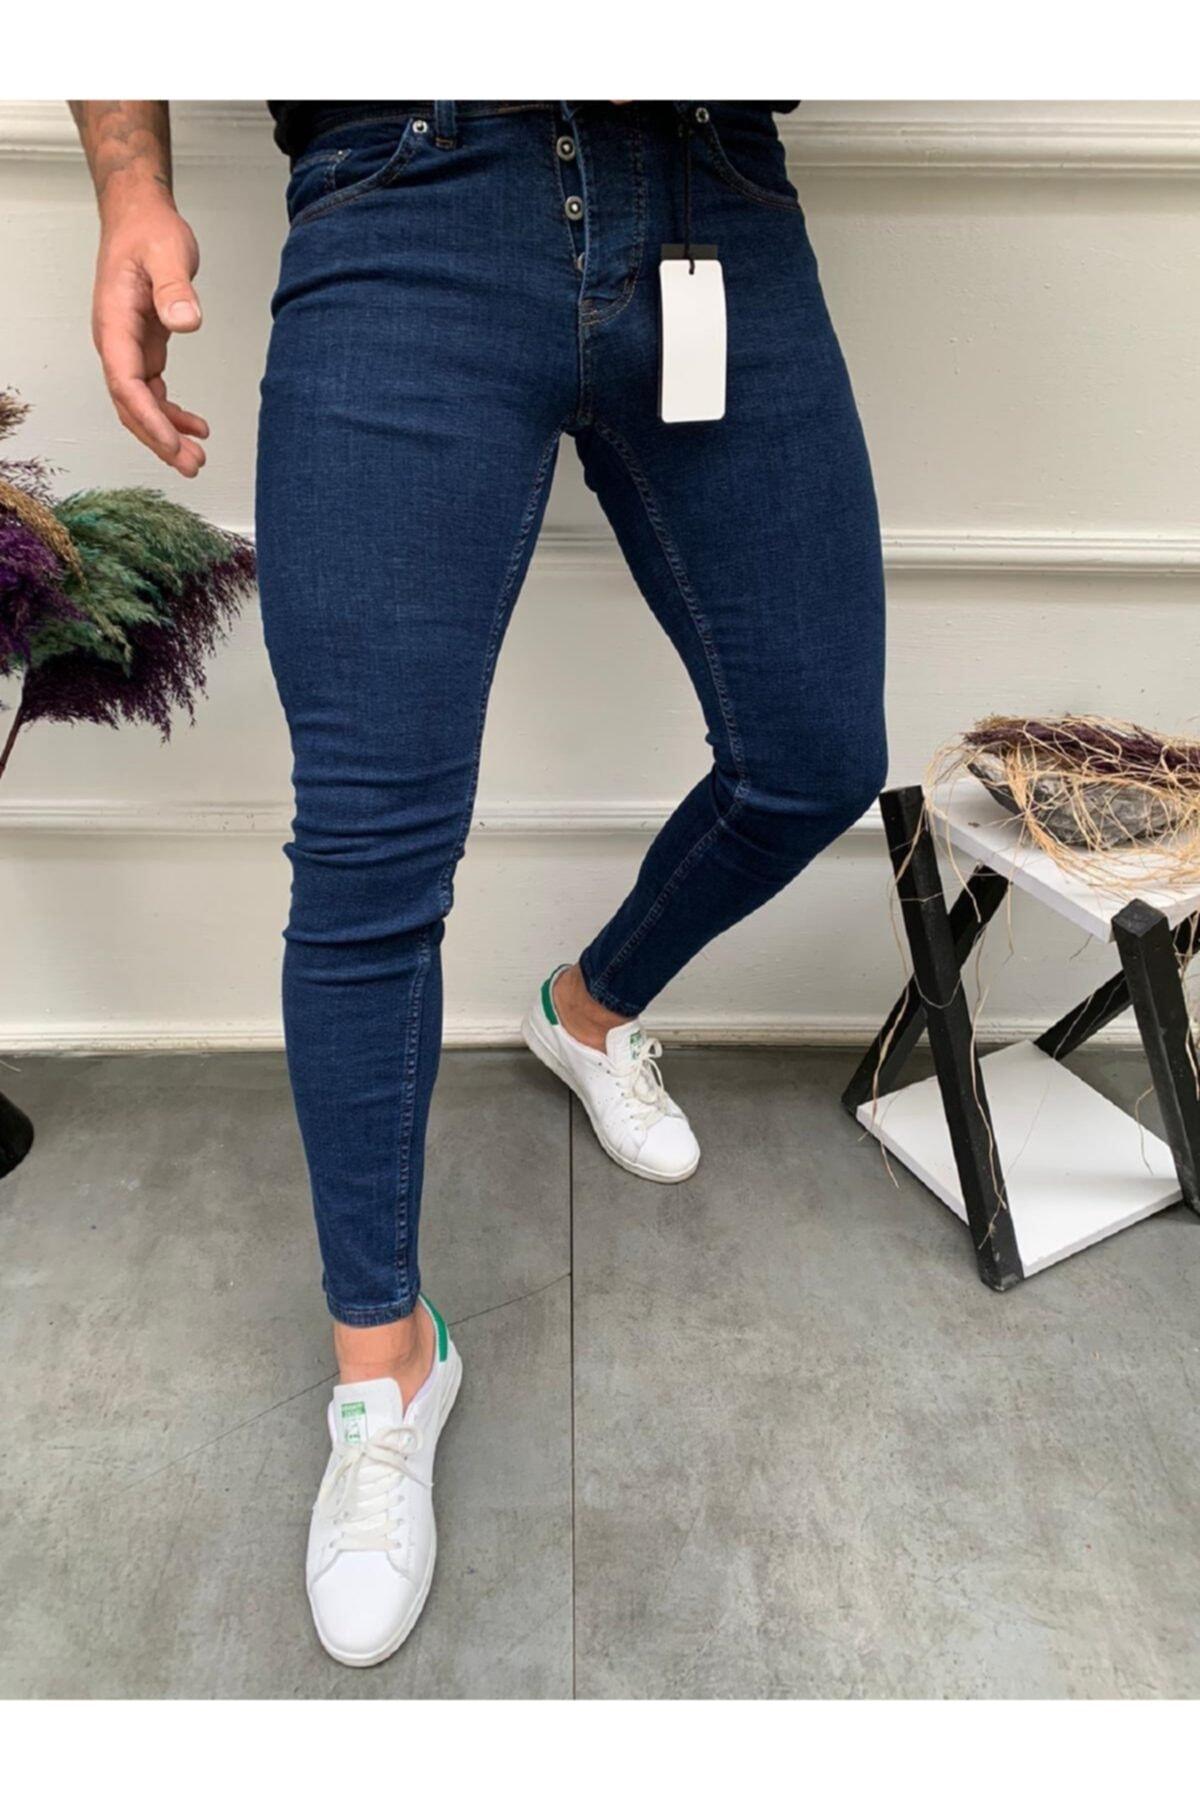 MCM Shopping Erkek Jean Italyan Kesim Denım Kot Mavi Pantolon Skınny Fit 1